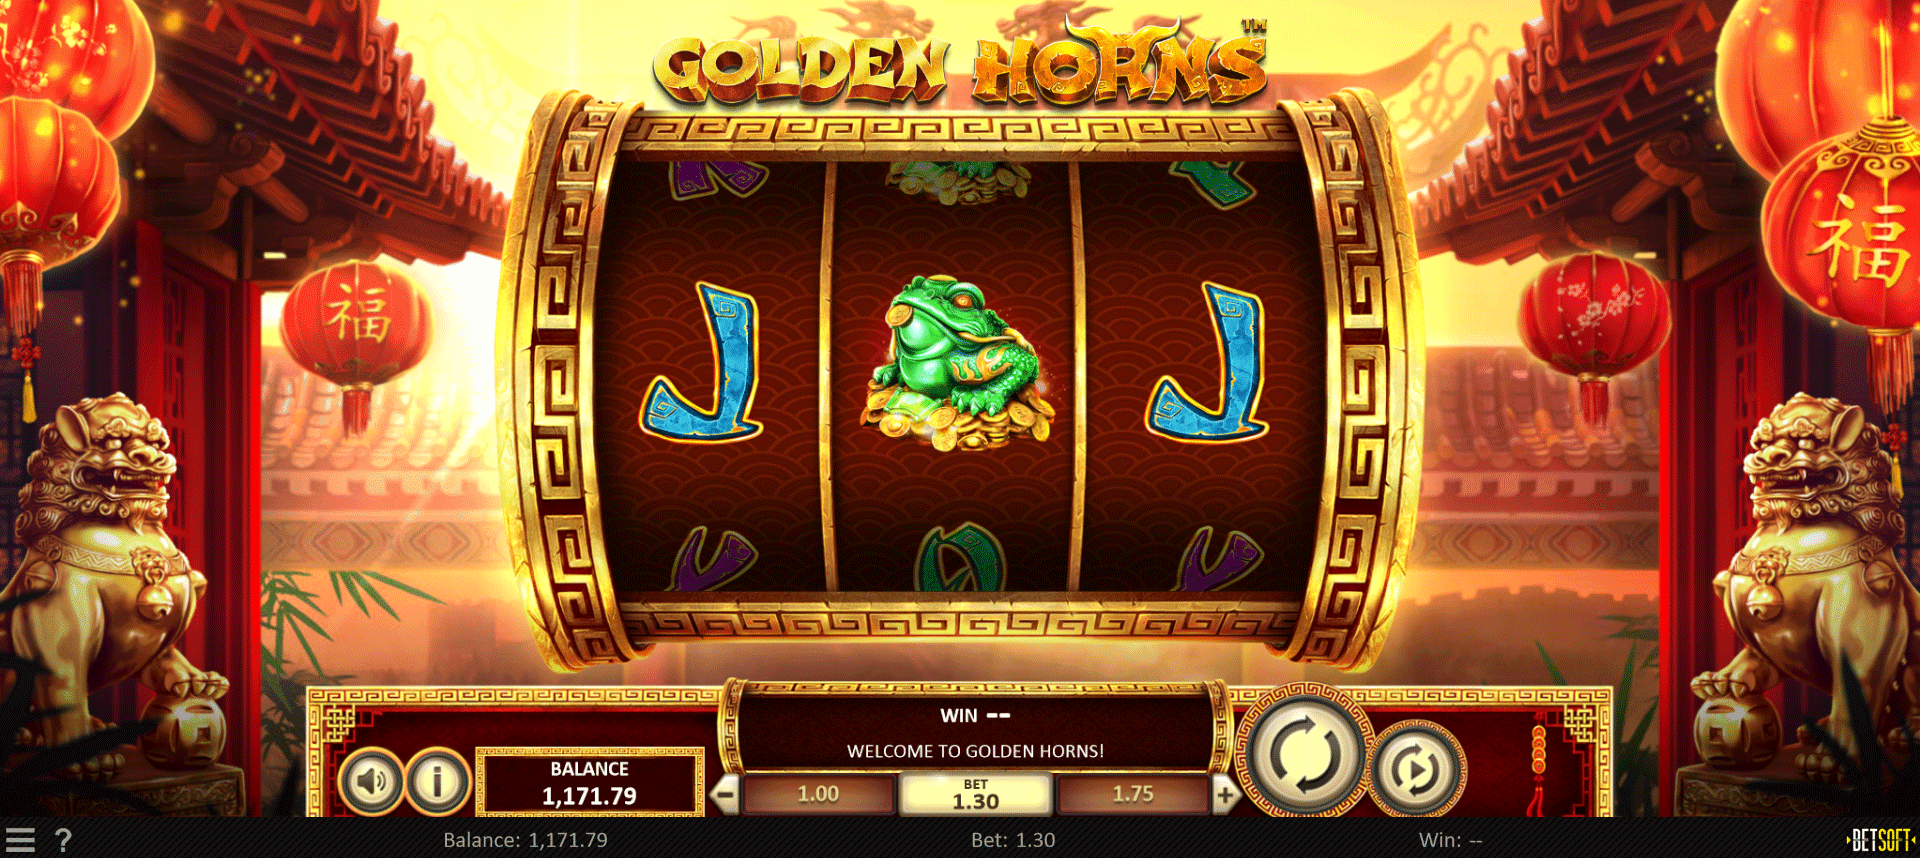 Slot Golden Horns